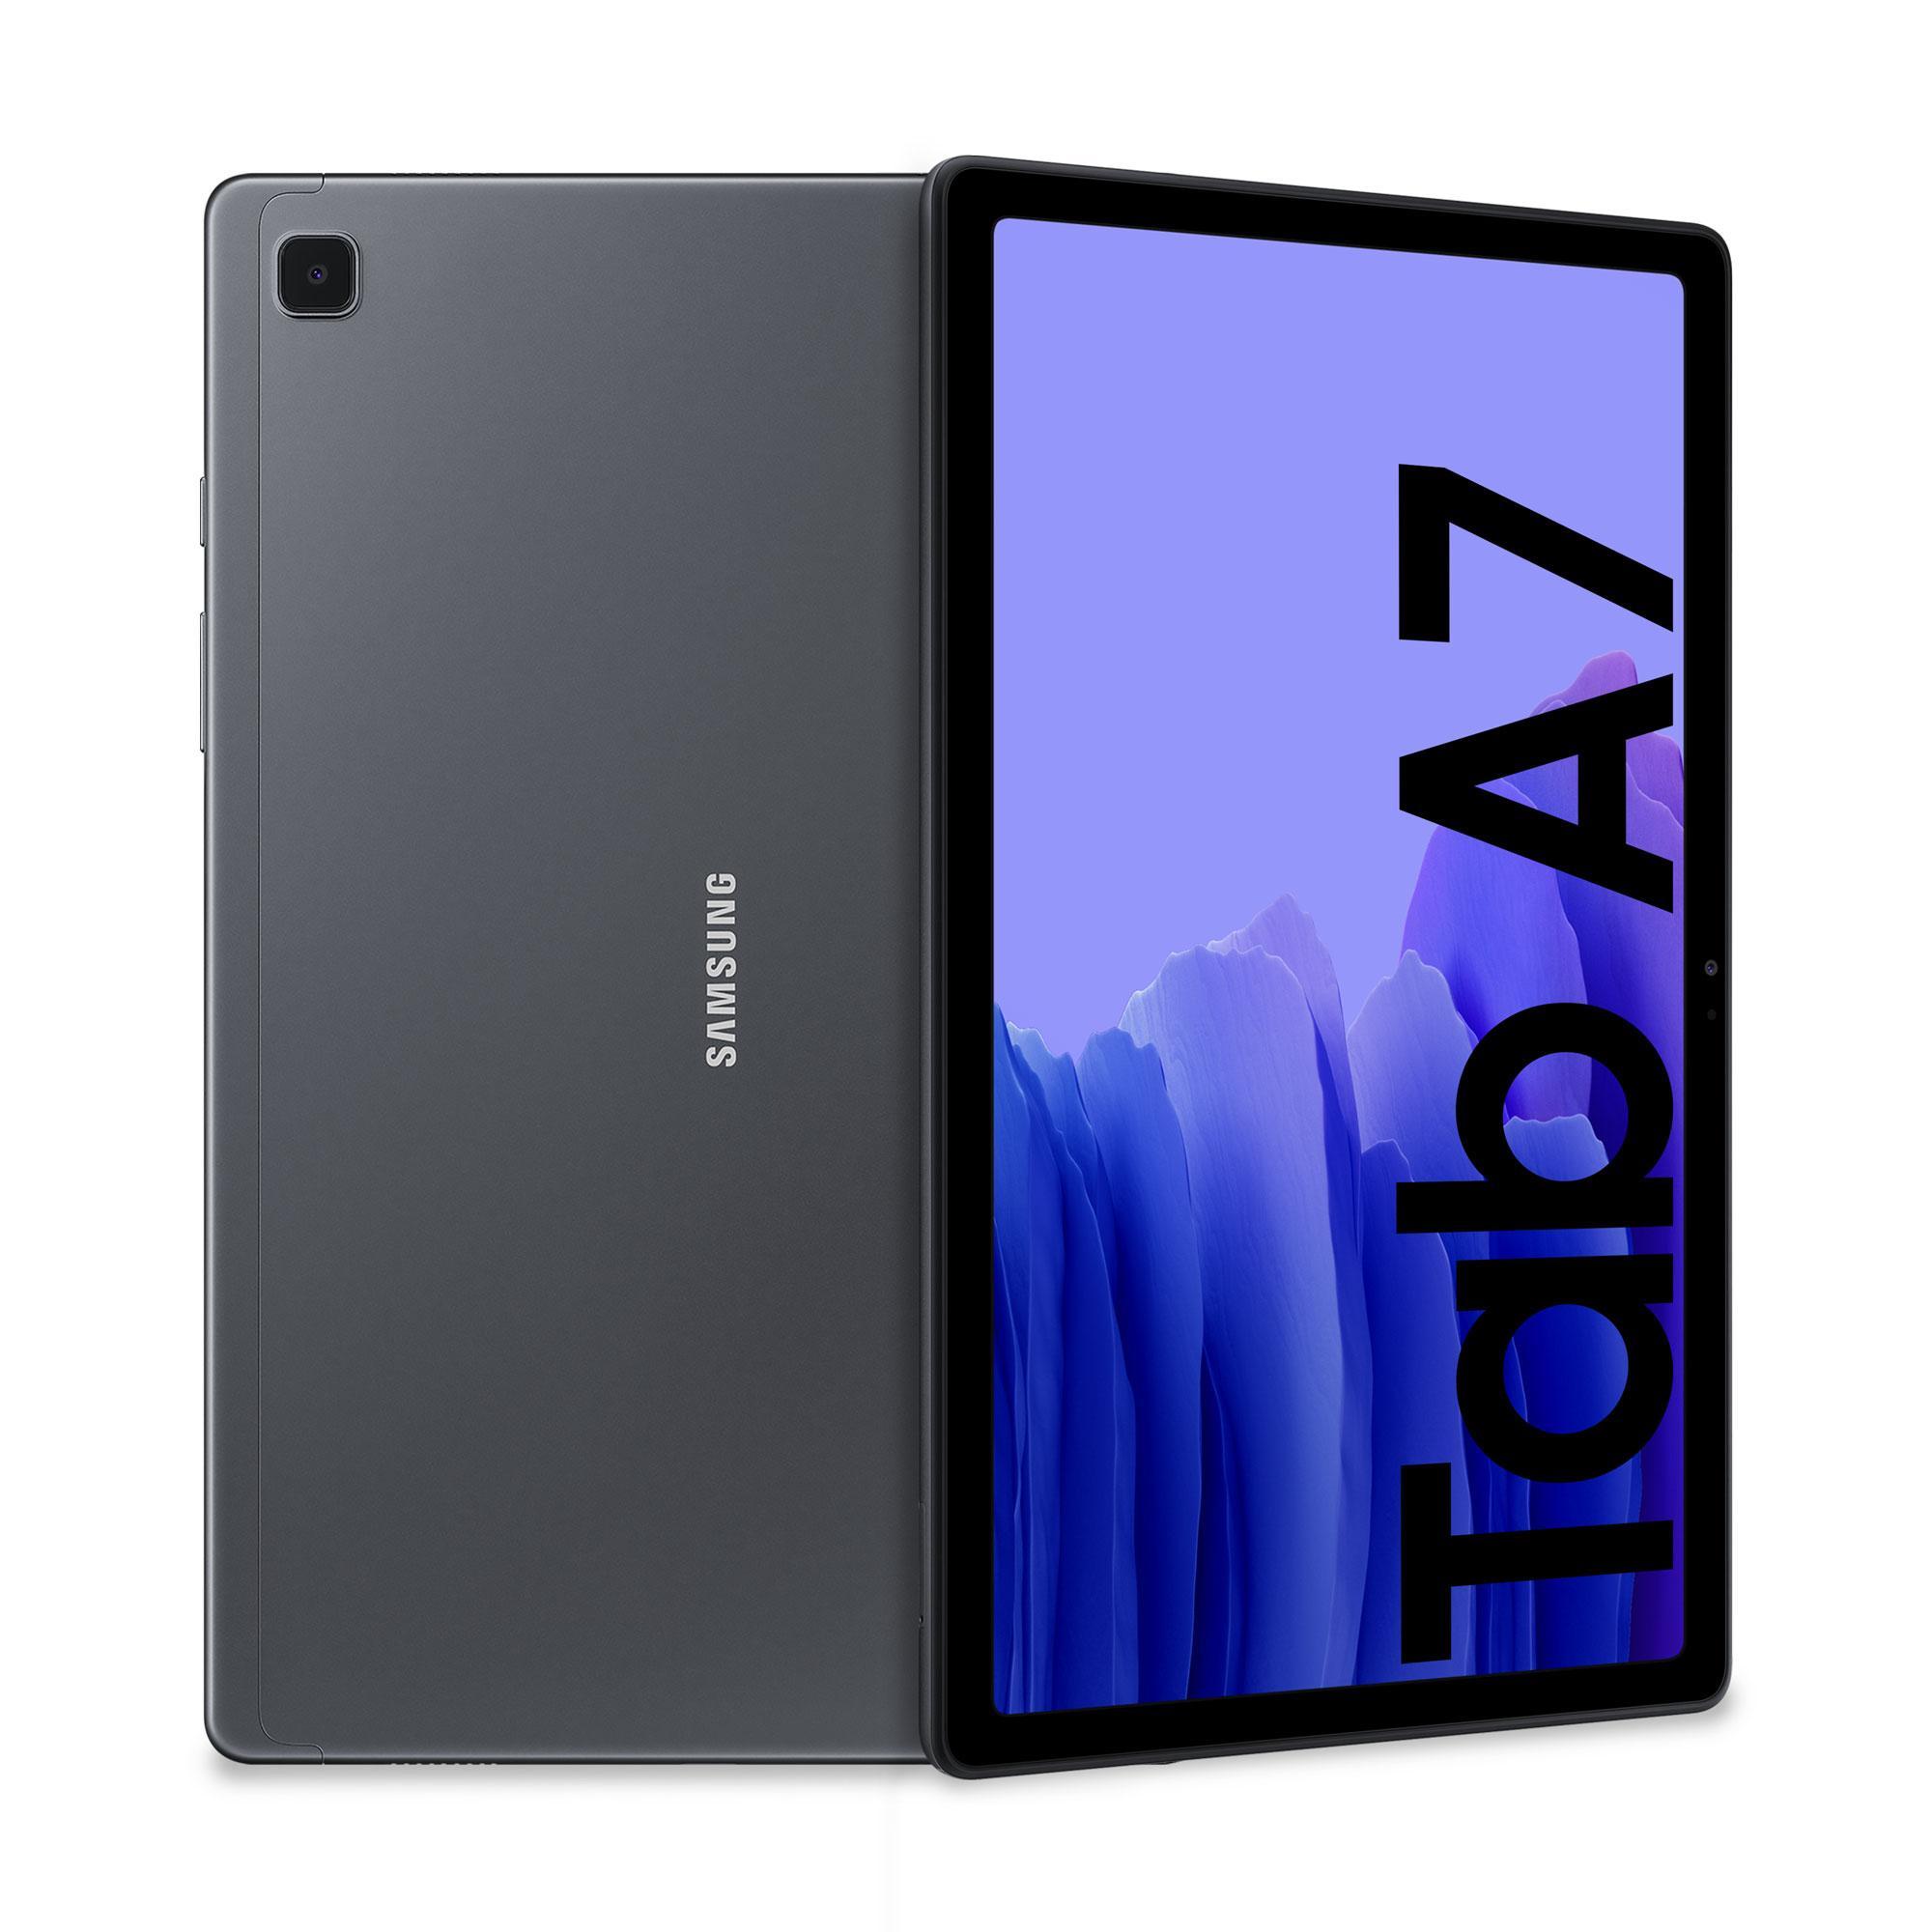 "Samsung Galaxy Tab A7 Tablet, Display 10.4"" TFT, 32GB Espandibili fino a 1TB, RAM 3GB, Batteria 7.040 mAh, LTE, Android 10, Fotocamera posteriore 8 MP, Dark Gray"